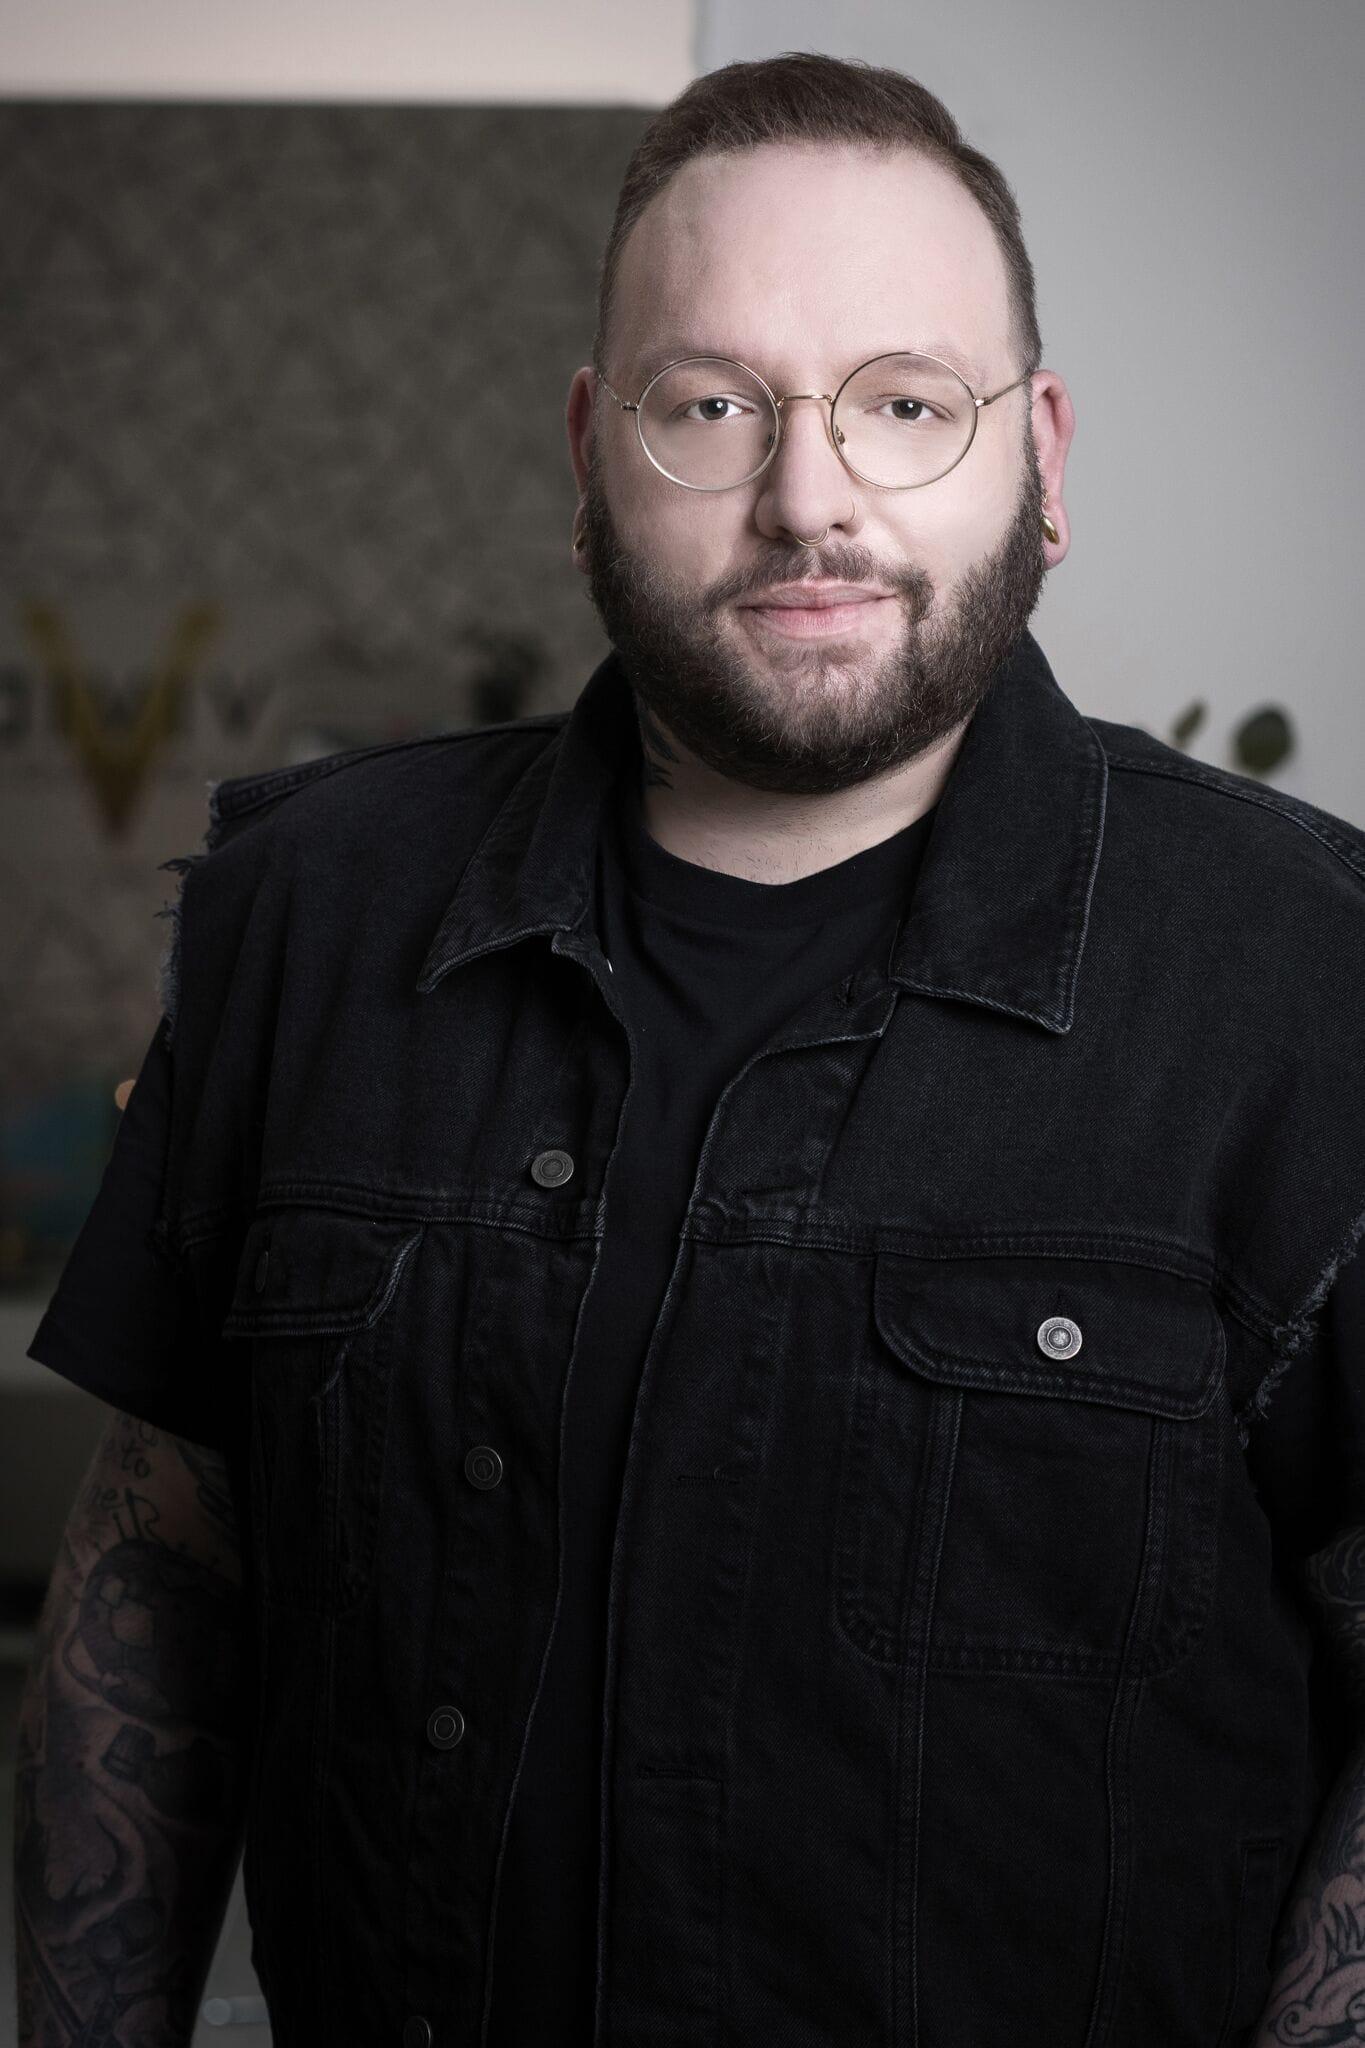 Headshot of Thomas, master hair stylist at Vivid Hair Studio.